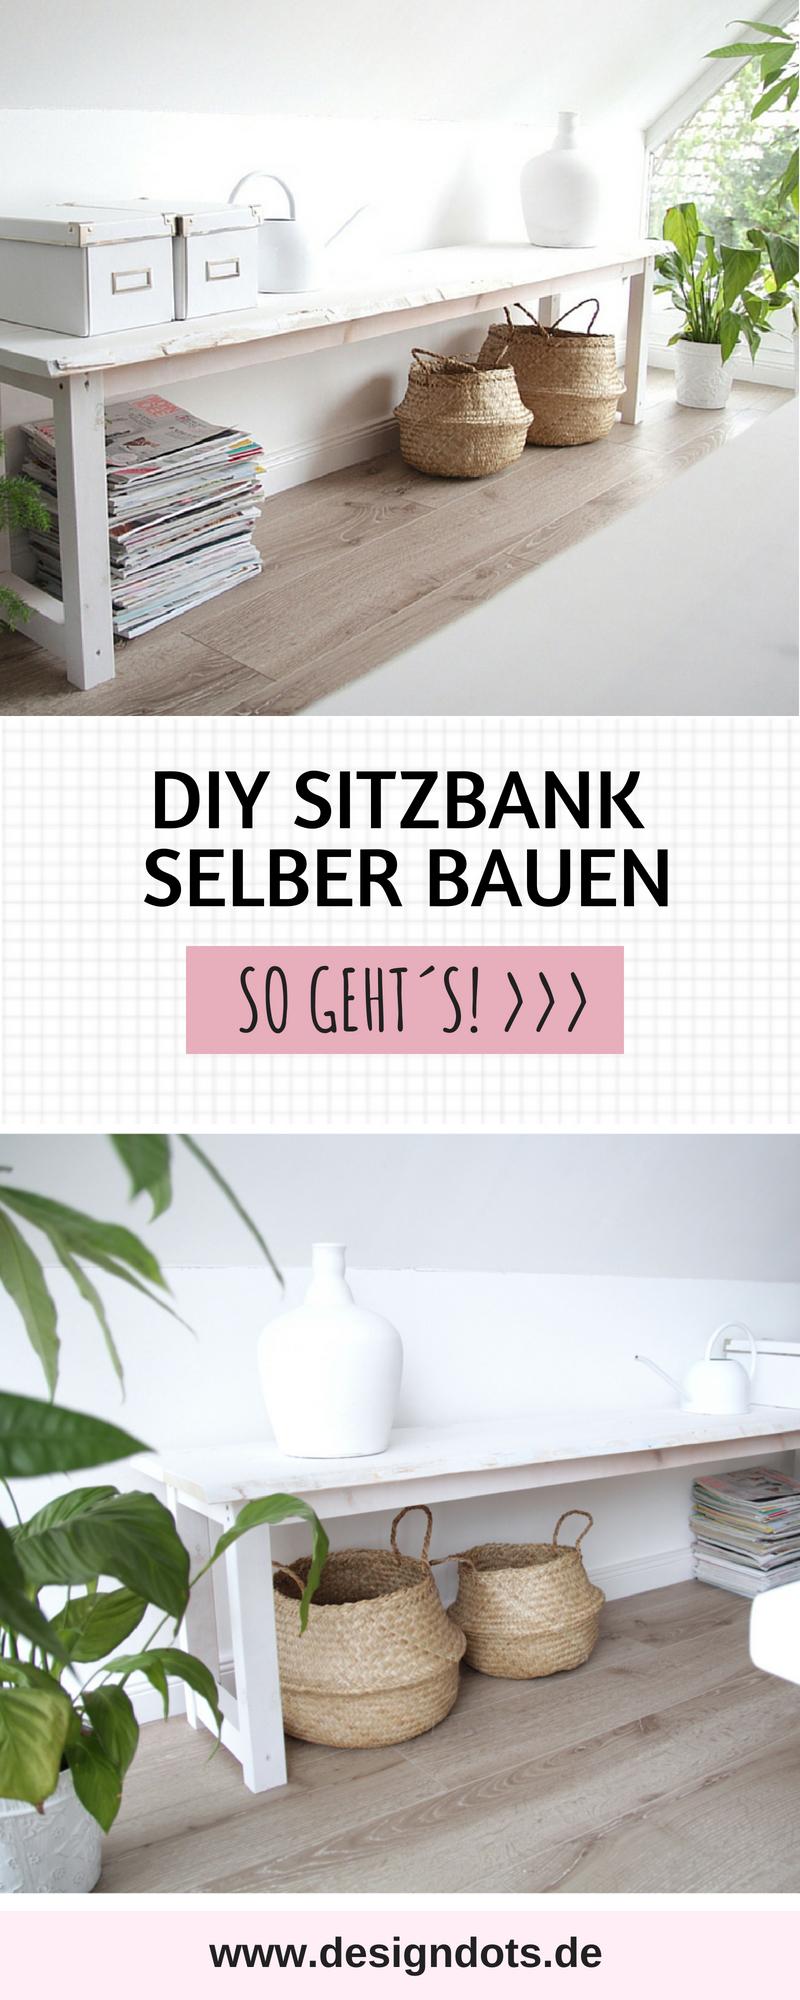 Beliebt DIY Sitzbank selber bauen Anleitung - DESIGN DOTS UI12